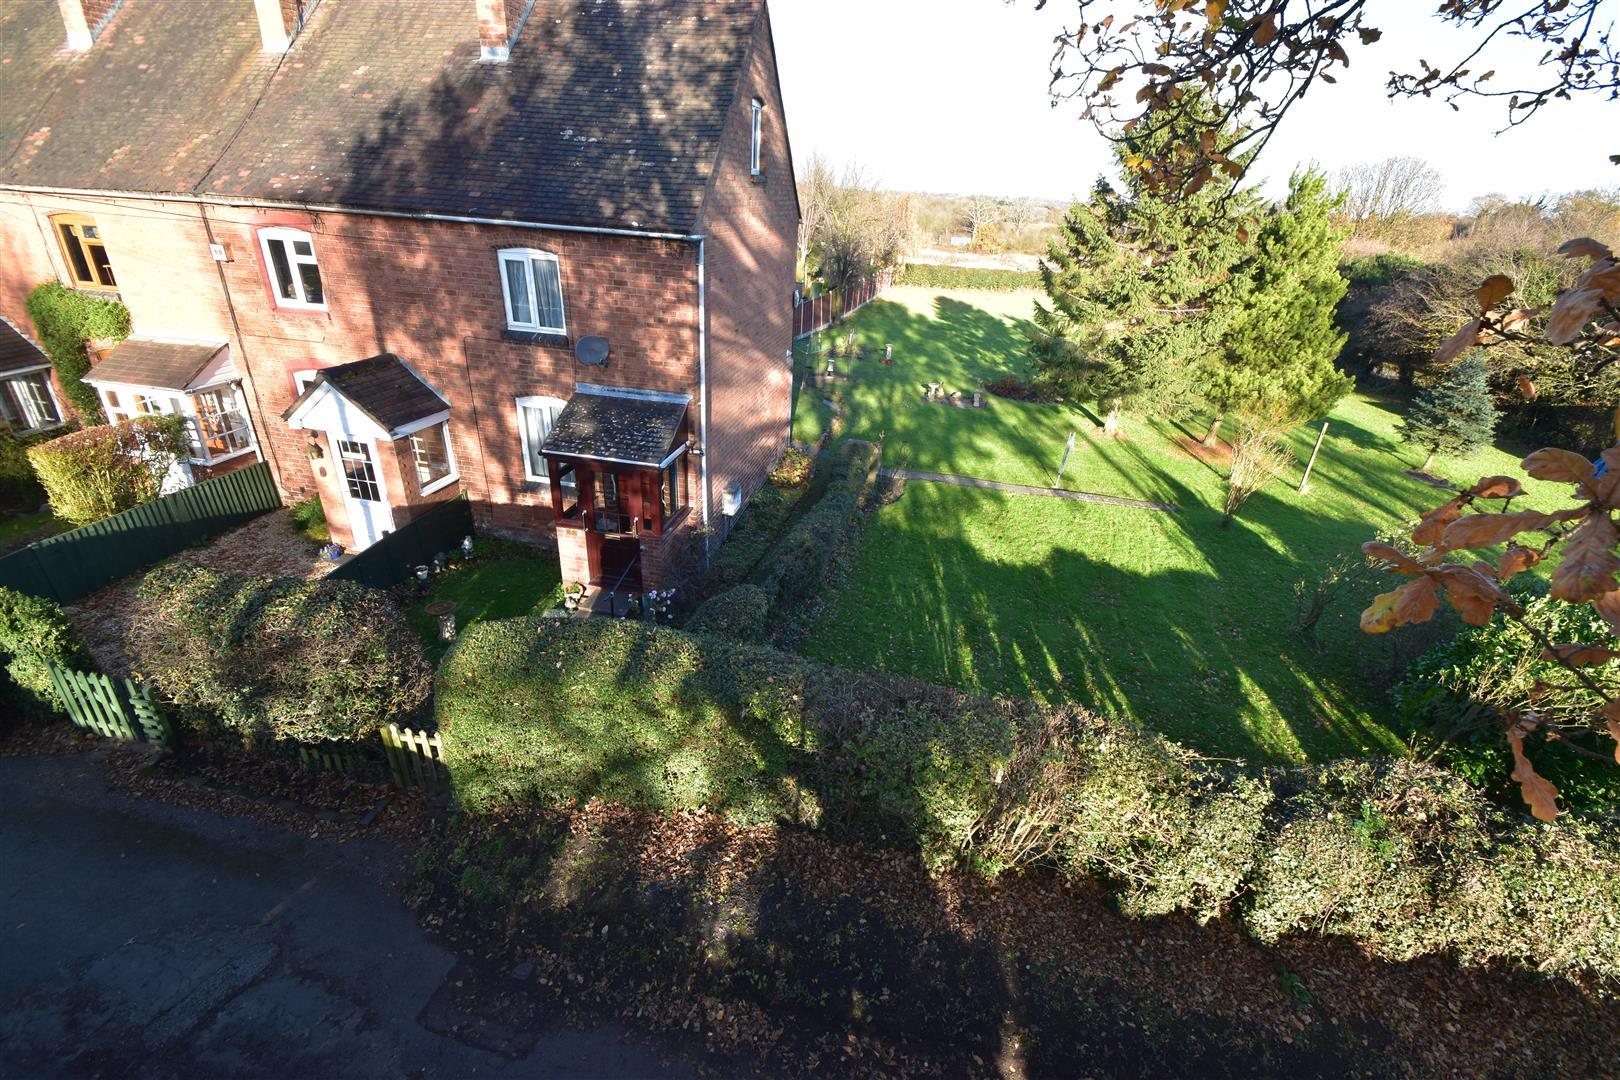 3 Bedrooms End Of Terrace House for sale in Walton Road, Hartlebury, Kidderminster